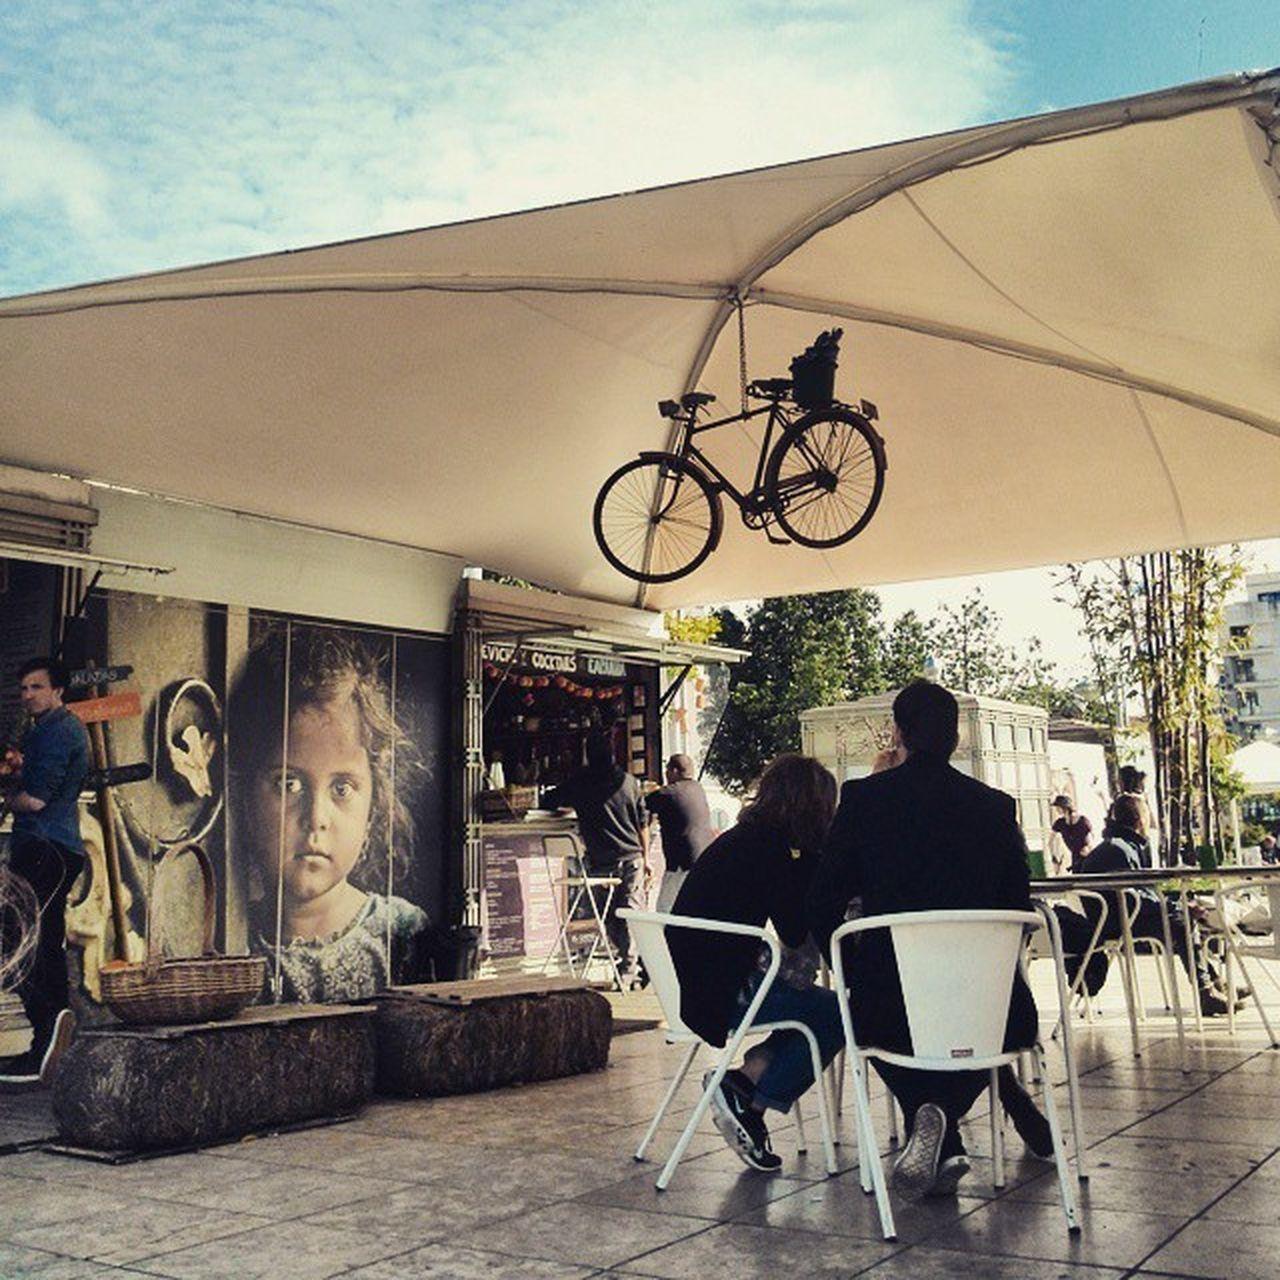 Hanging bikes Berlin style. Lisboa Sun Martimmoniz lisboalive